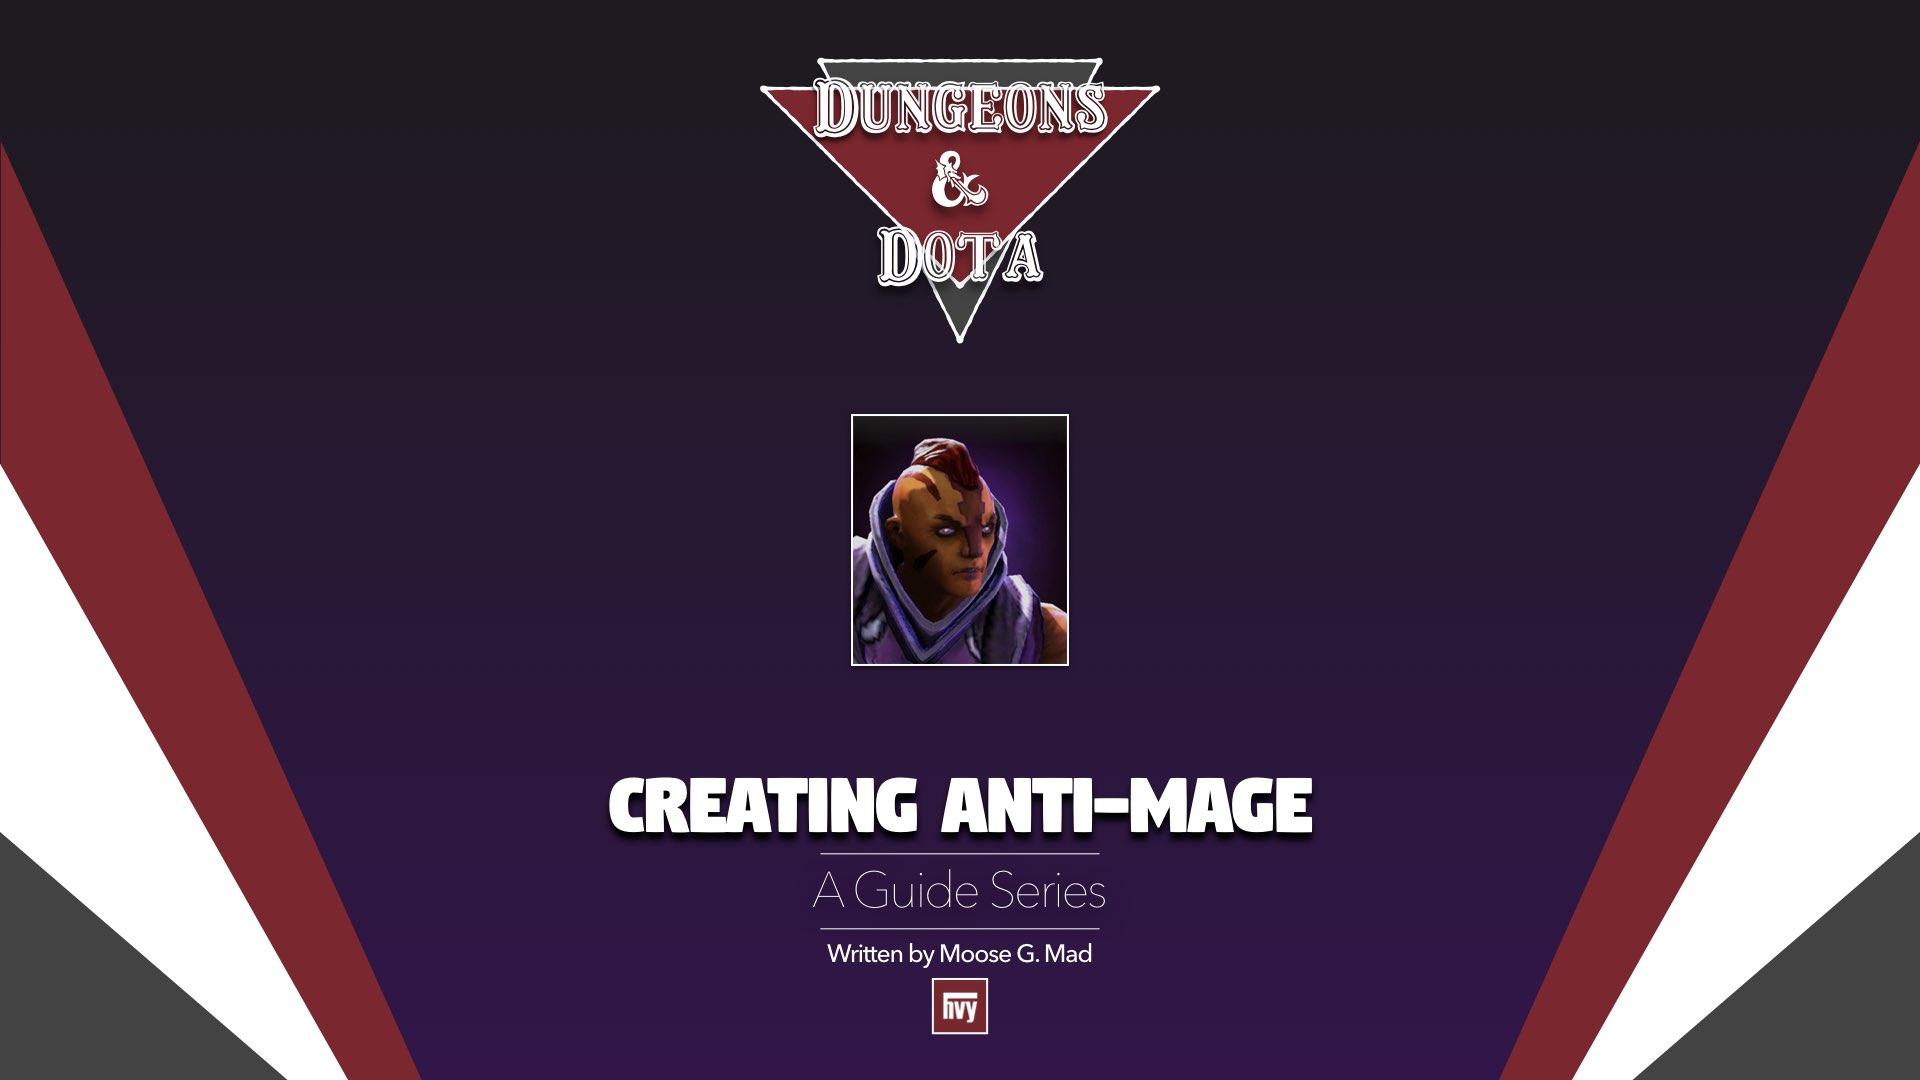 Dungeons and DotA: Creating Anti-Mage